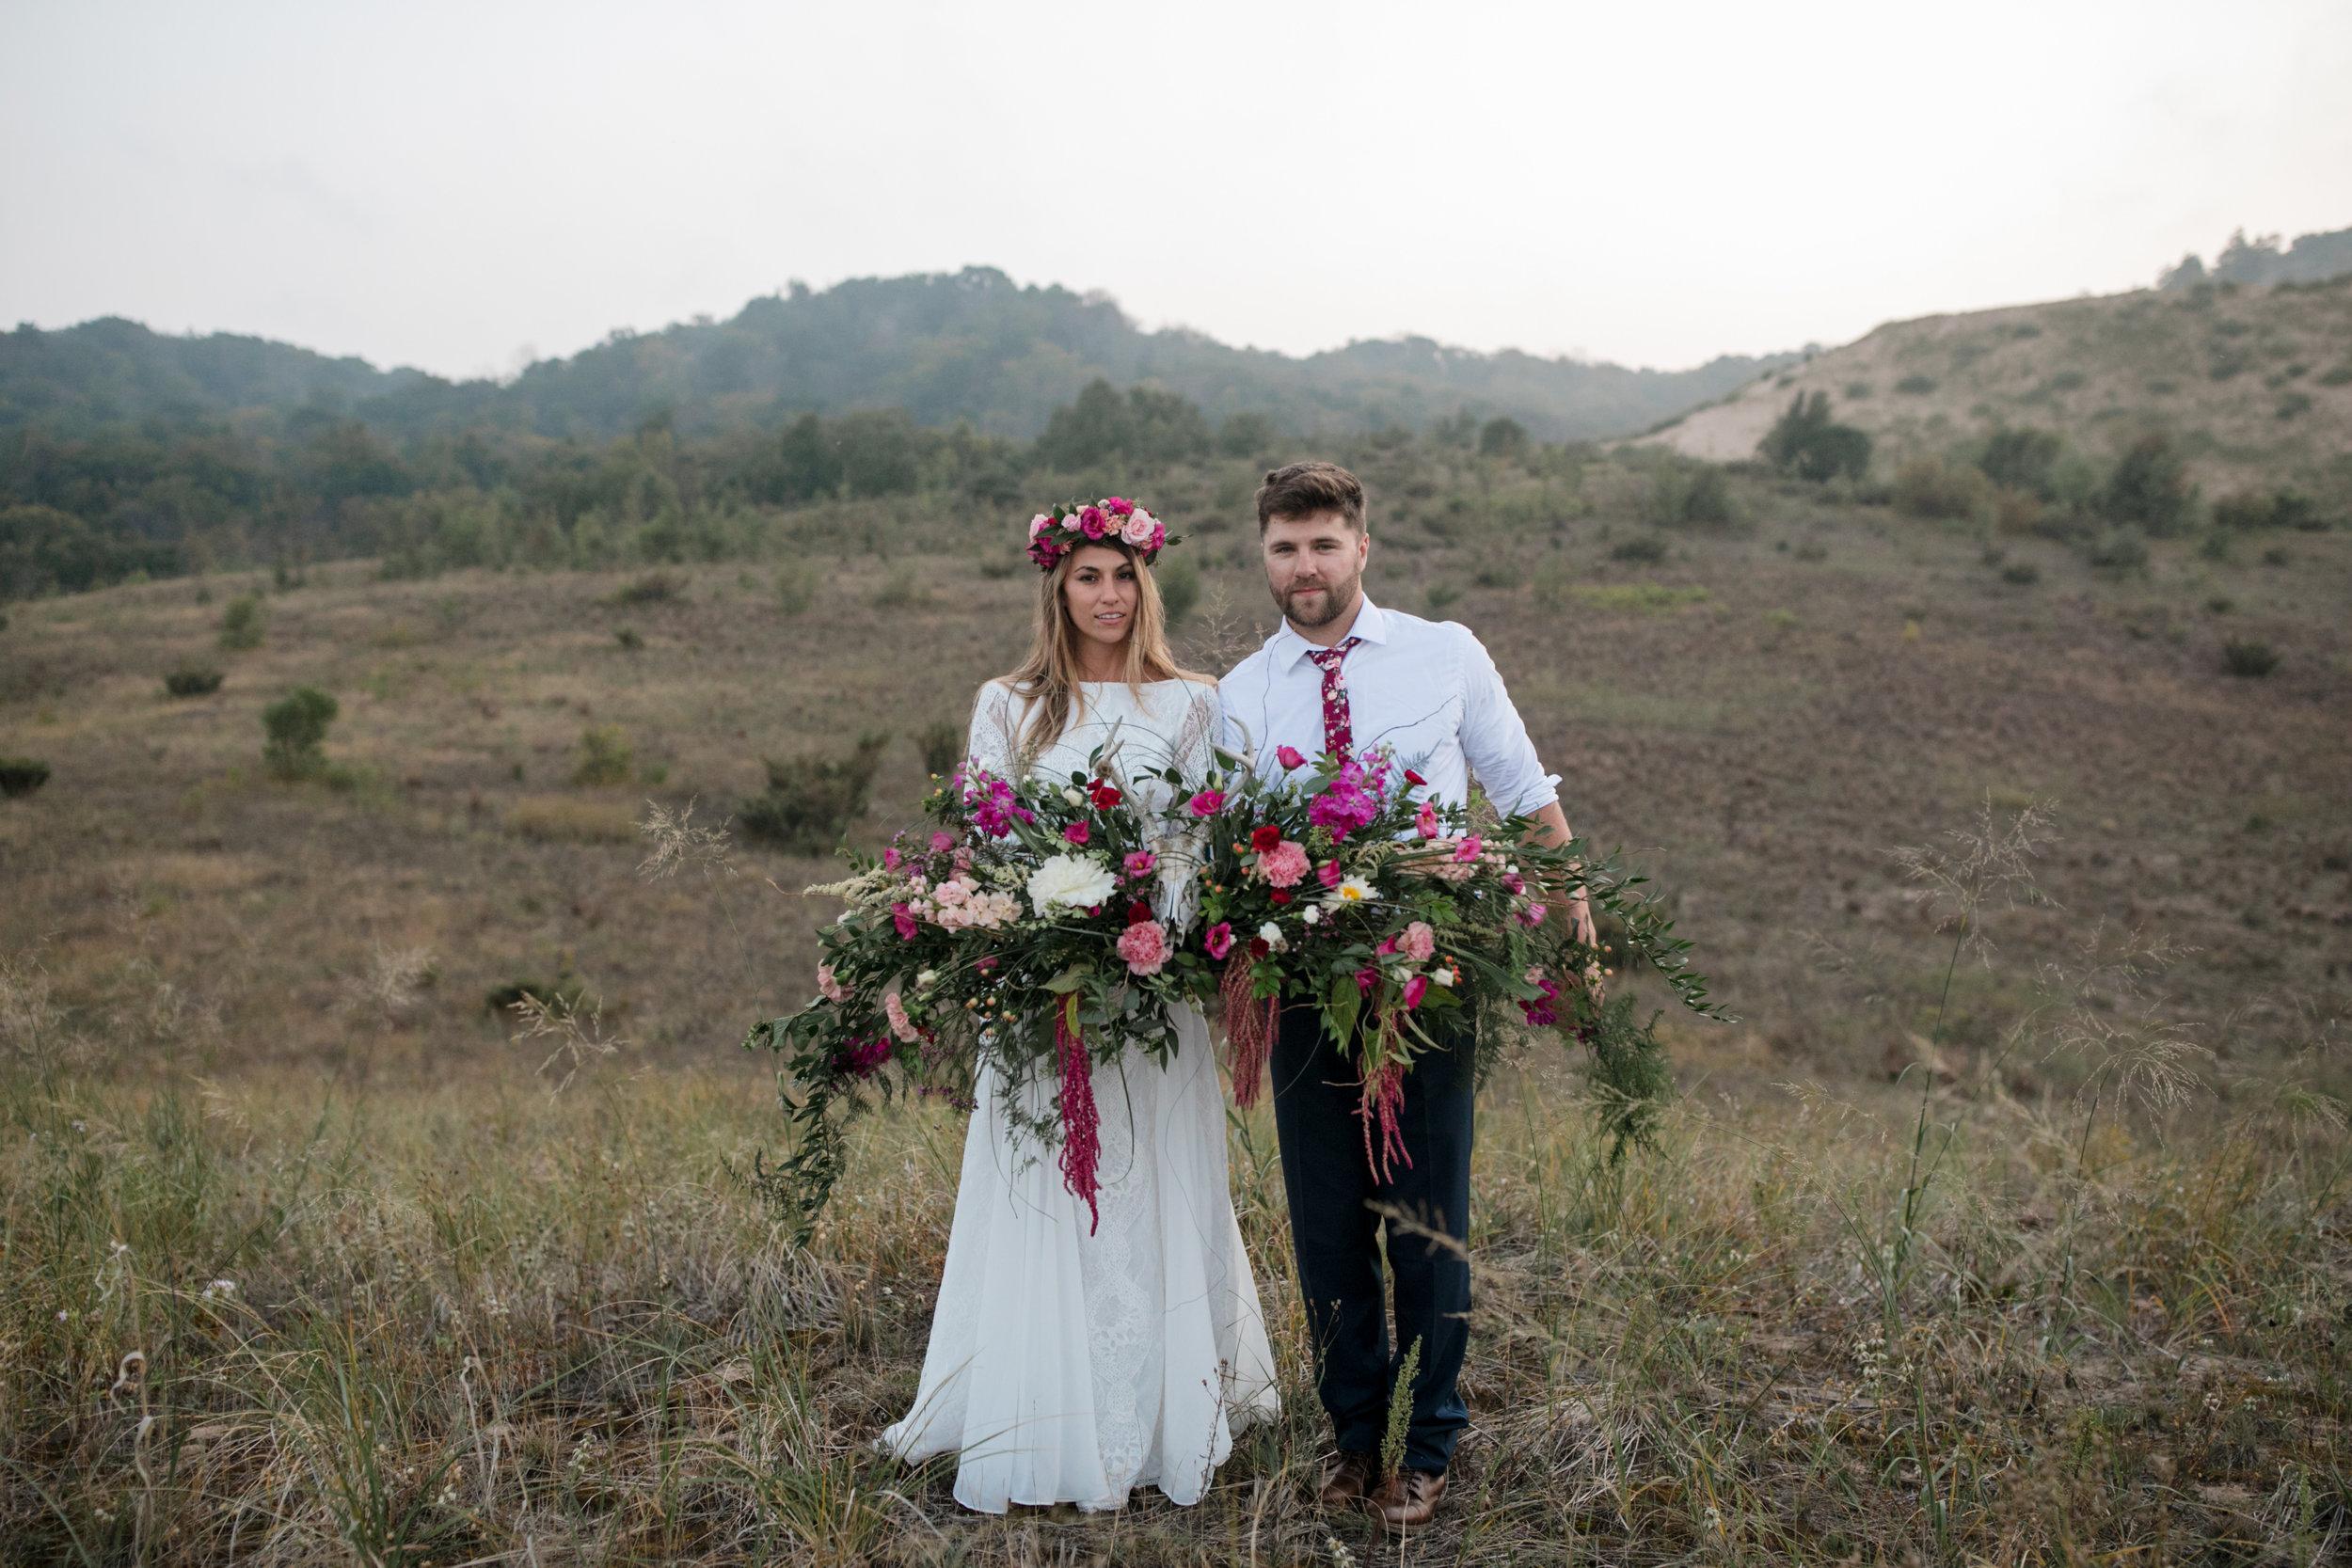 michigan-emotive-photographer-moonlight-elopement-mariha-hunter-184.jpg